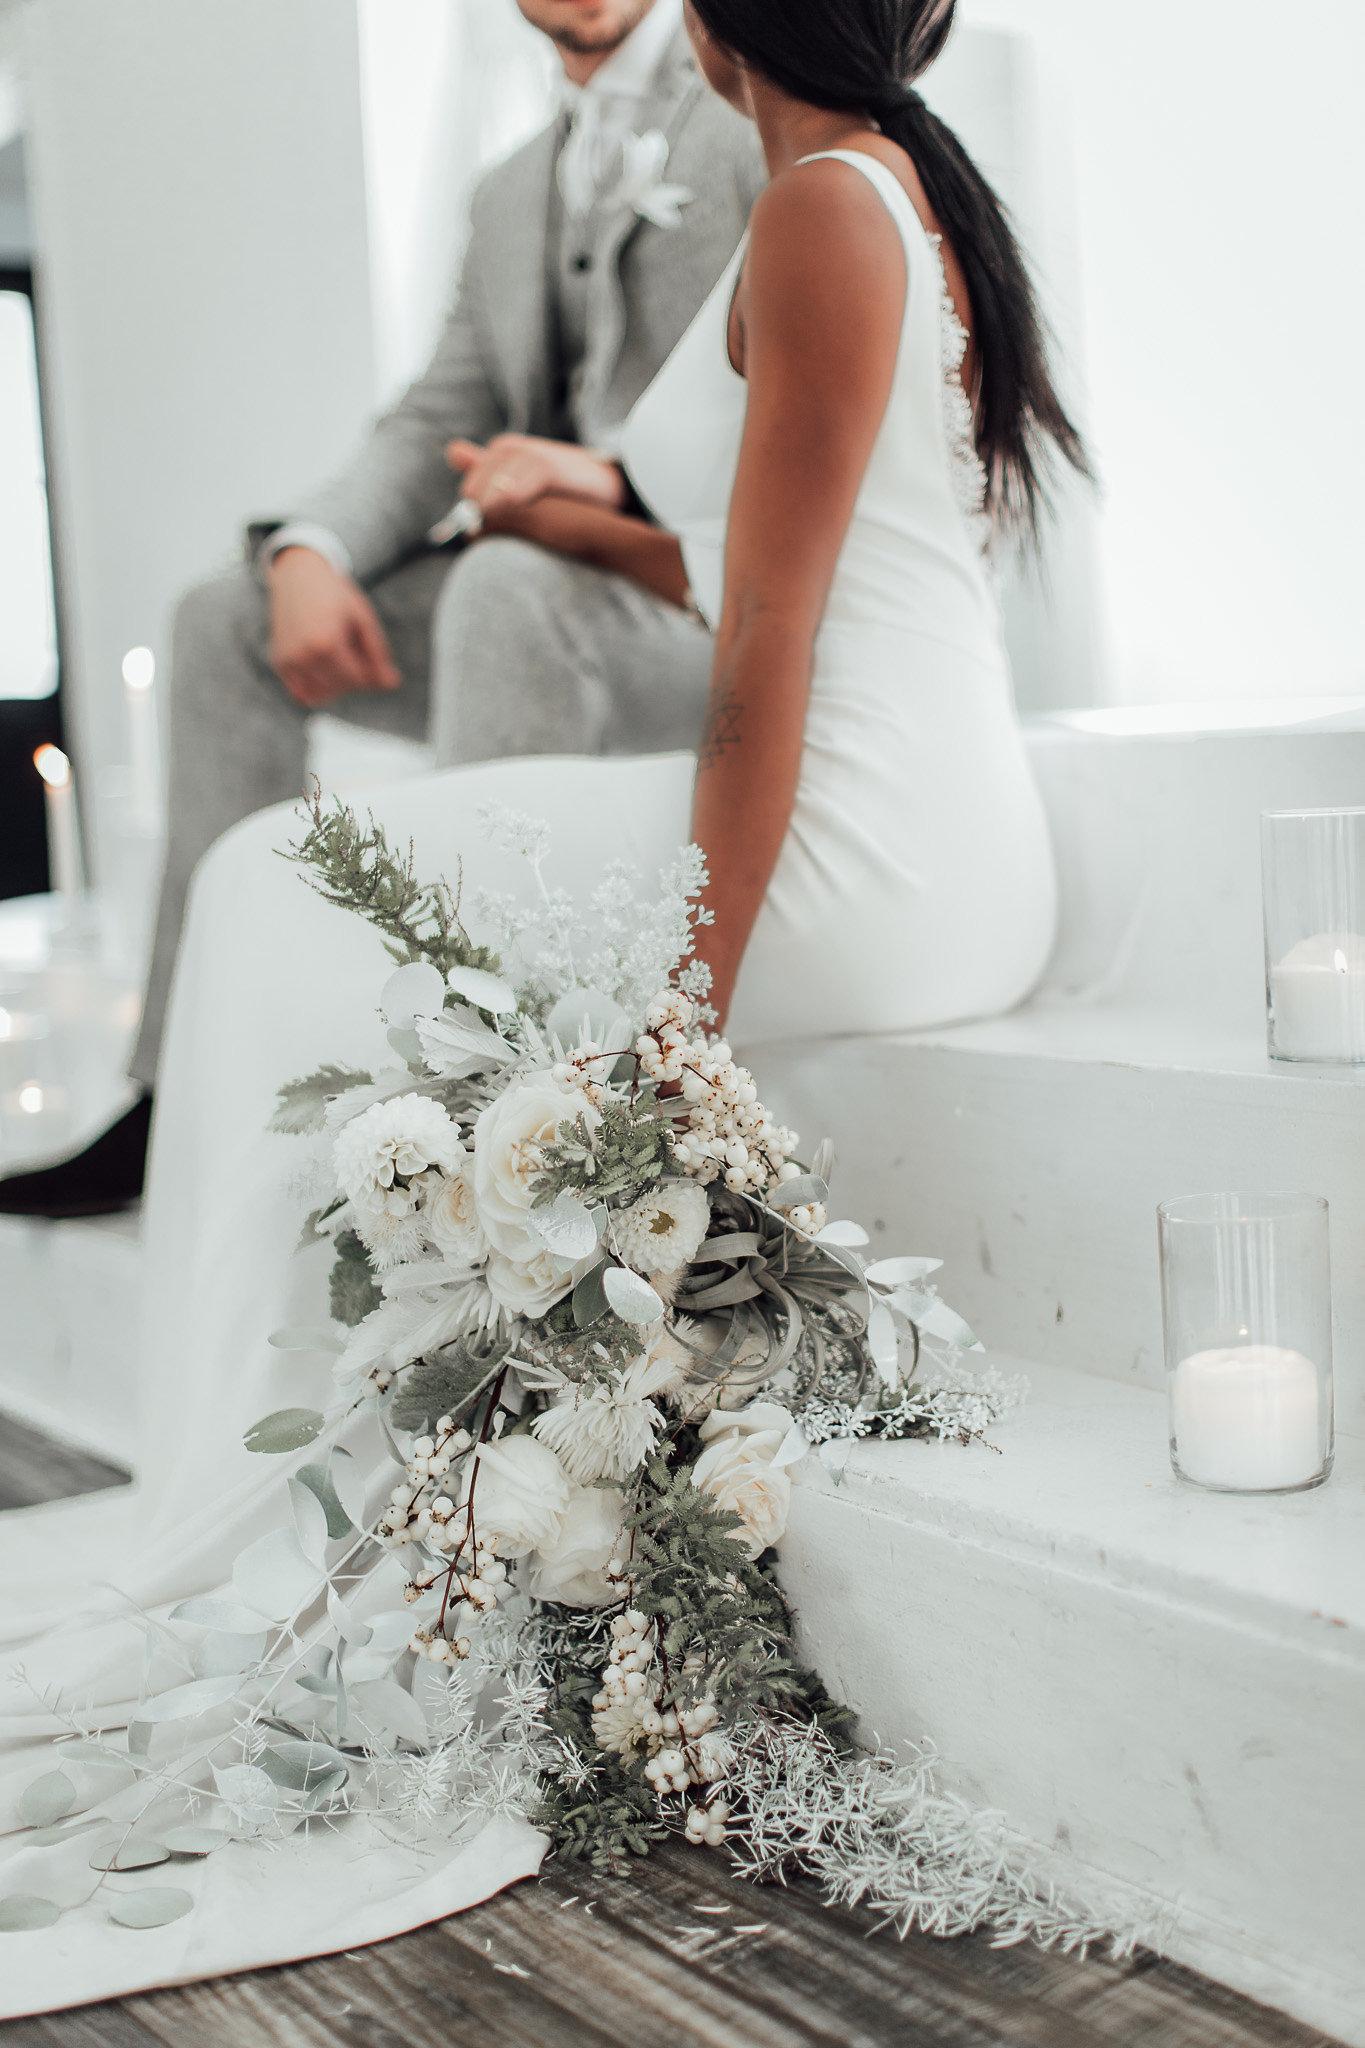 A New Winter Mix: Monochromatic White Wedding Styled Shoot Bouquet Inspiration